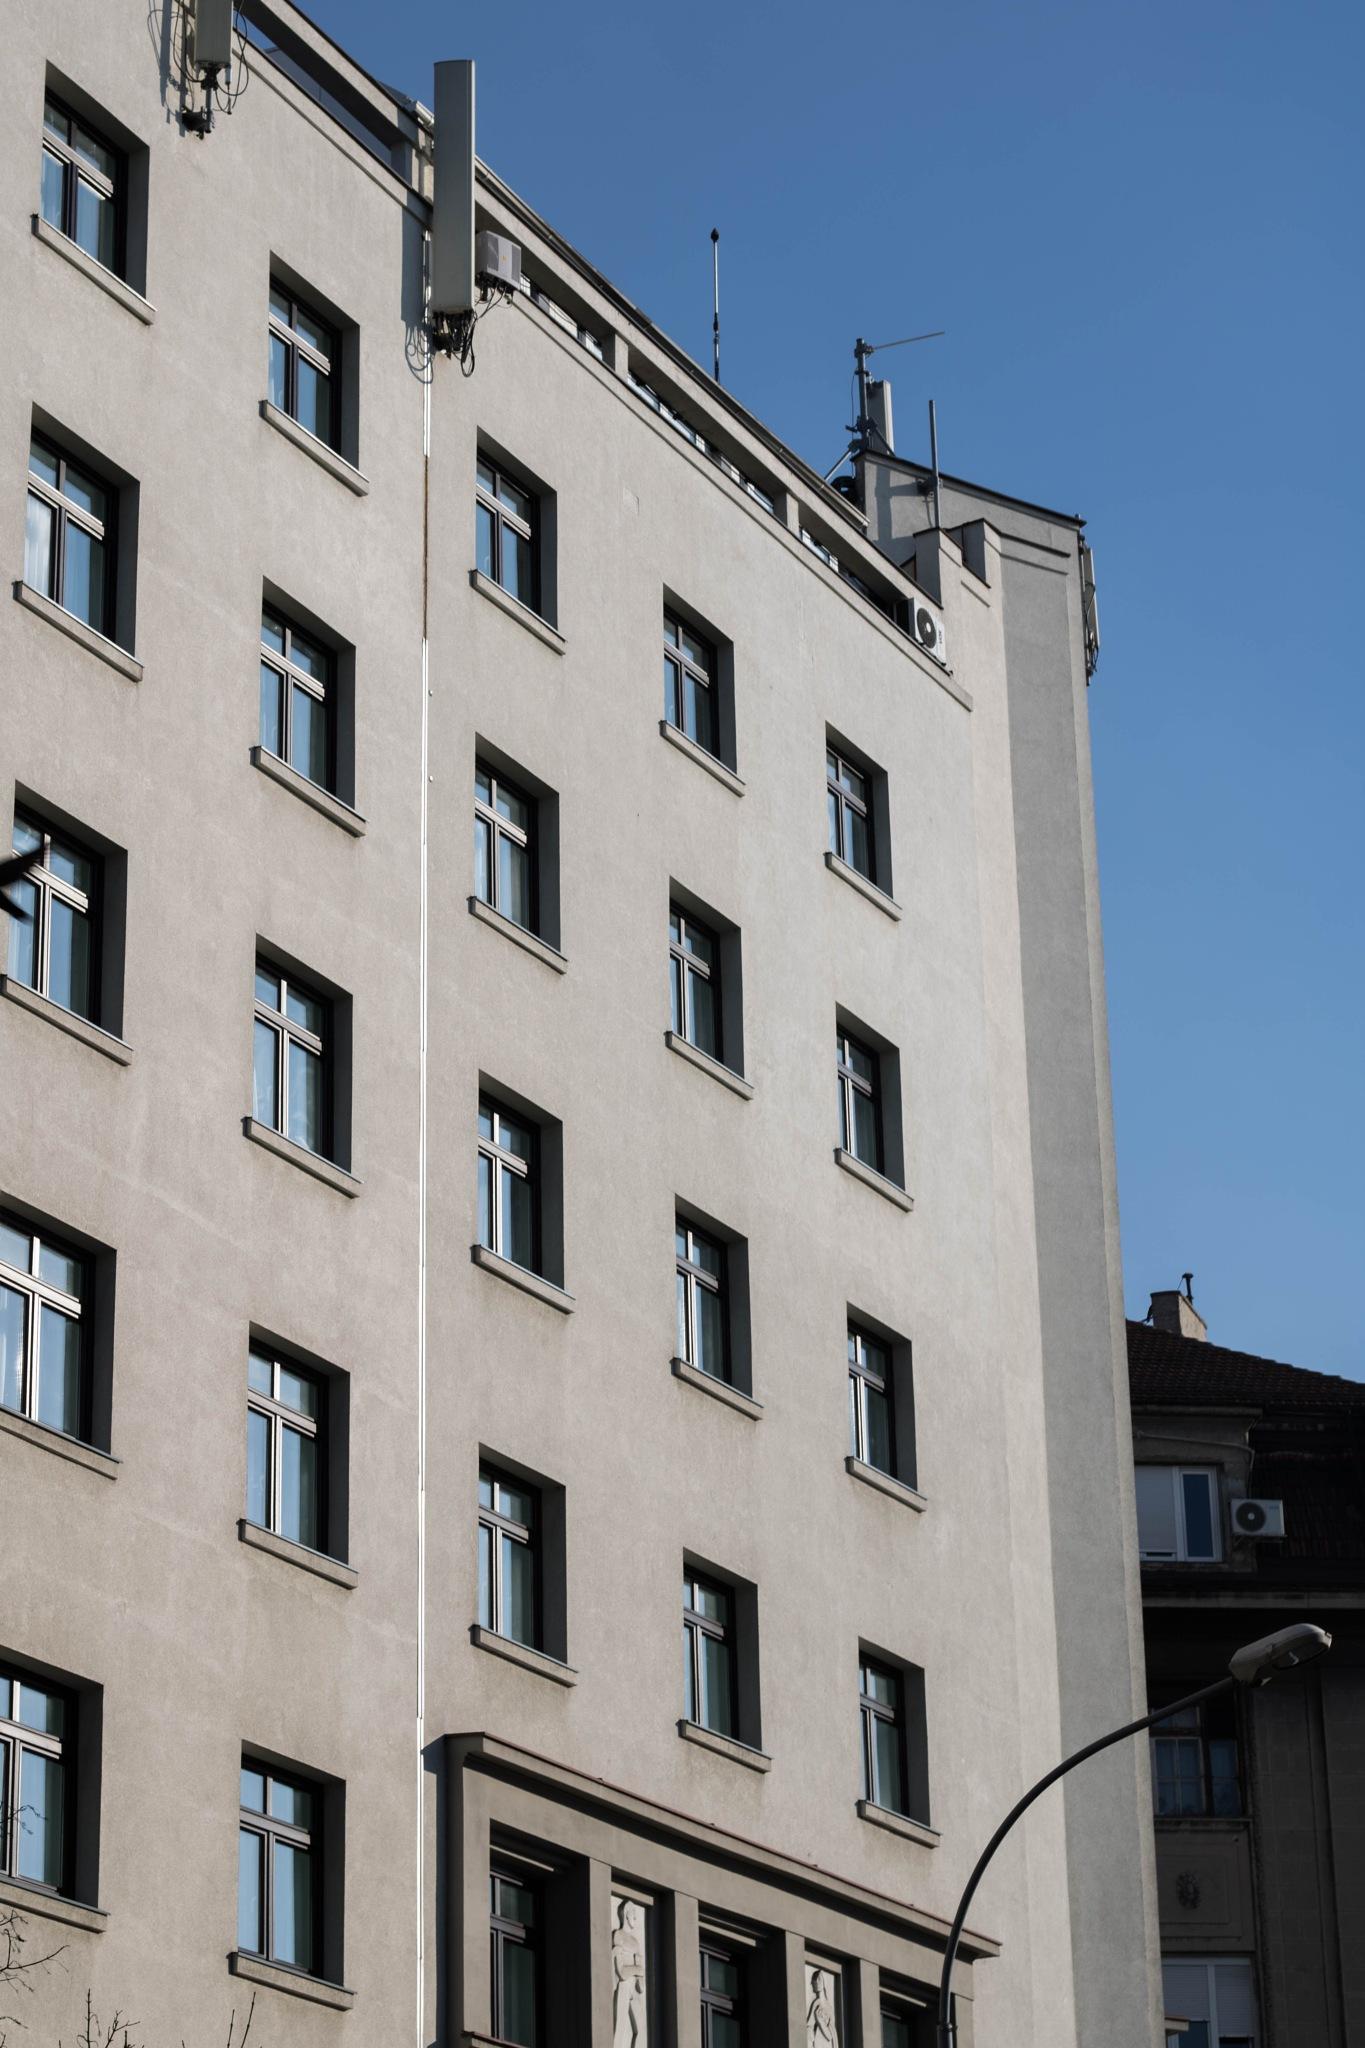 Building by SensiVisual